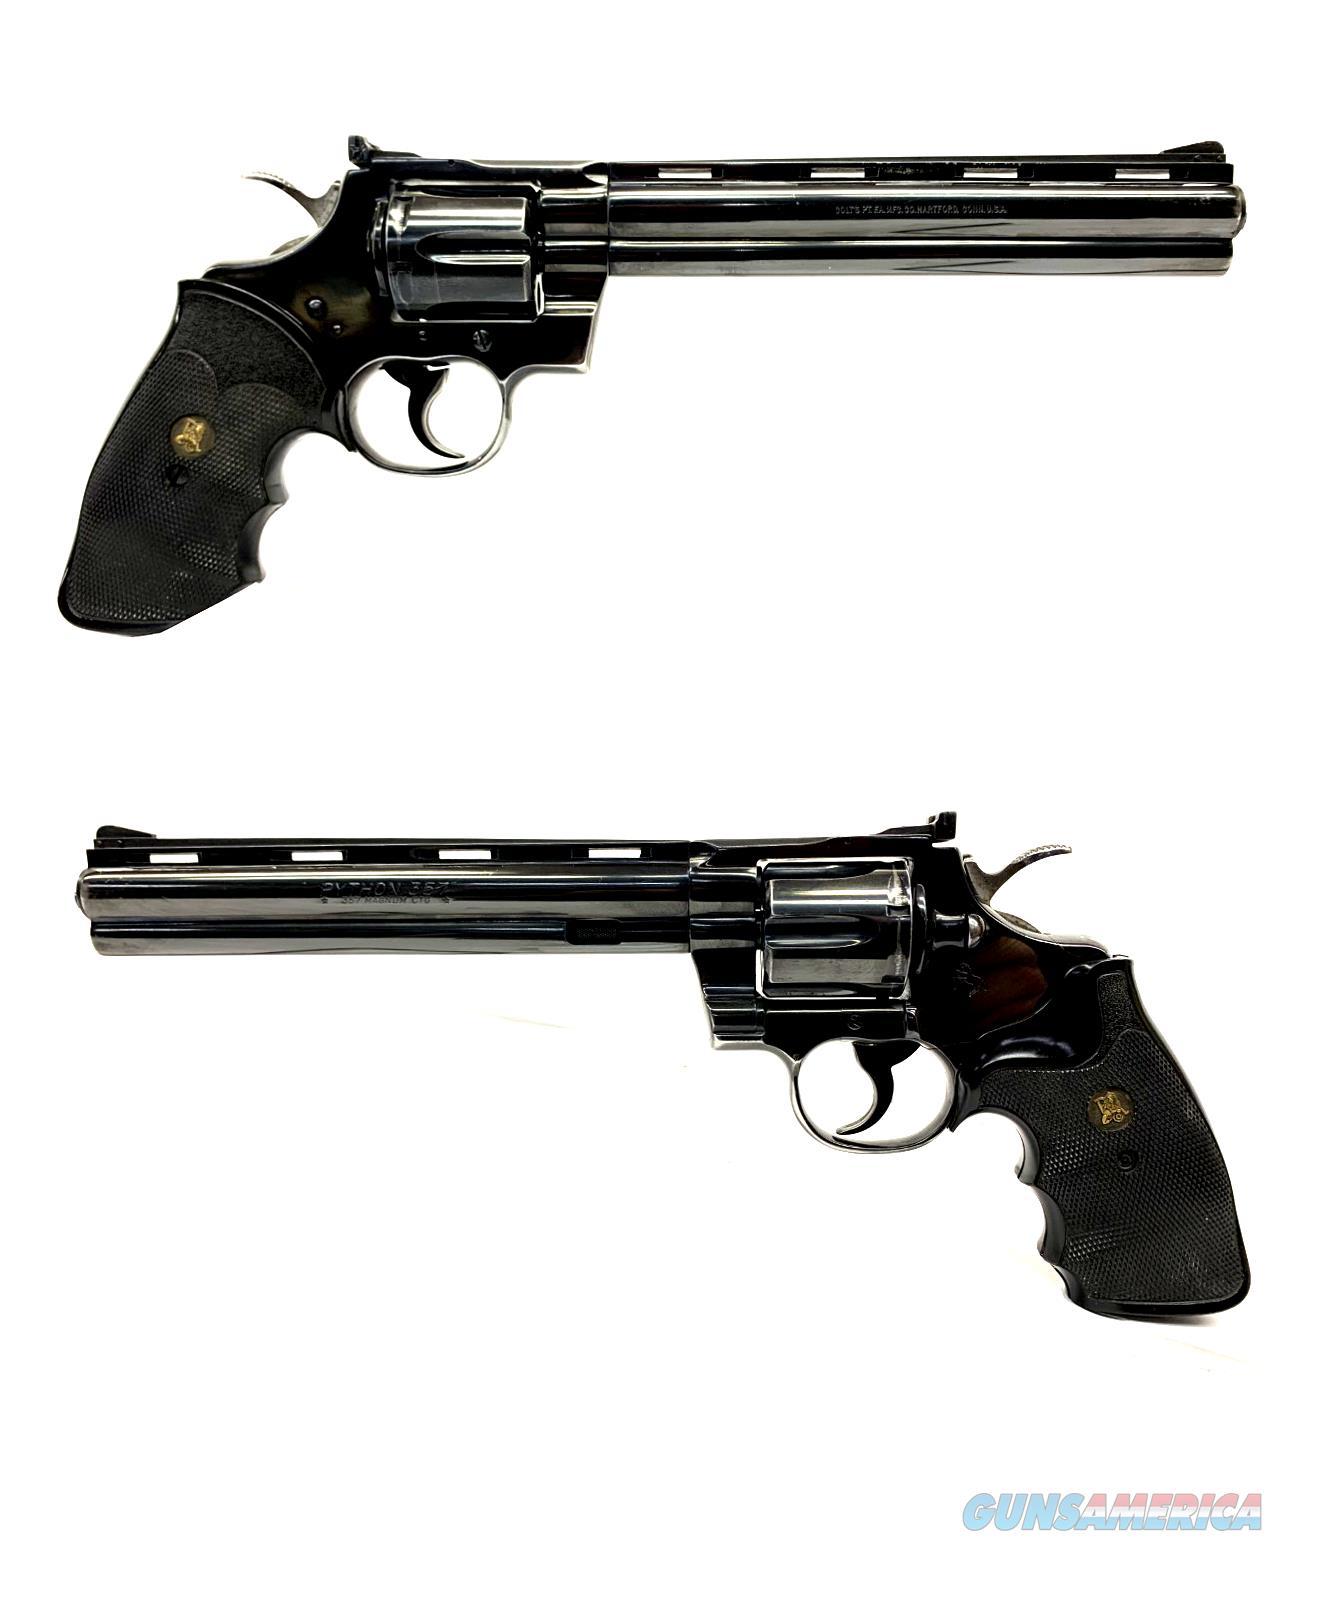 "Colt Python 8"" Barrel .357 MAGNUM Revolver  Guns > Pistols > Colt Double Action Revolvers- Modern"